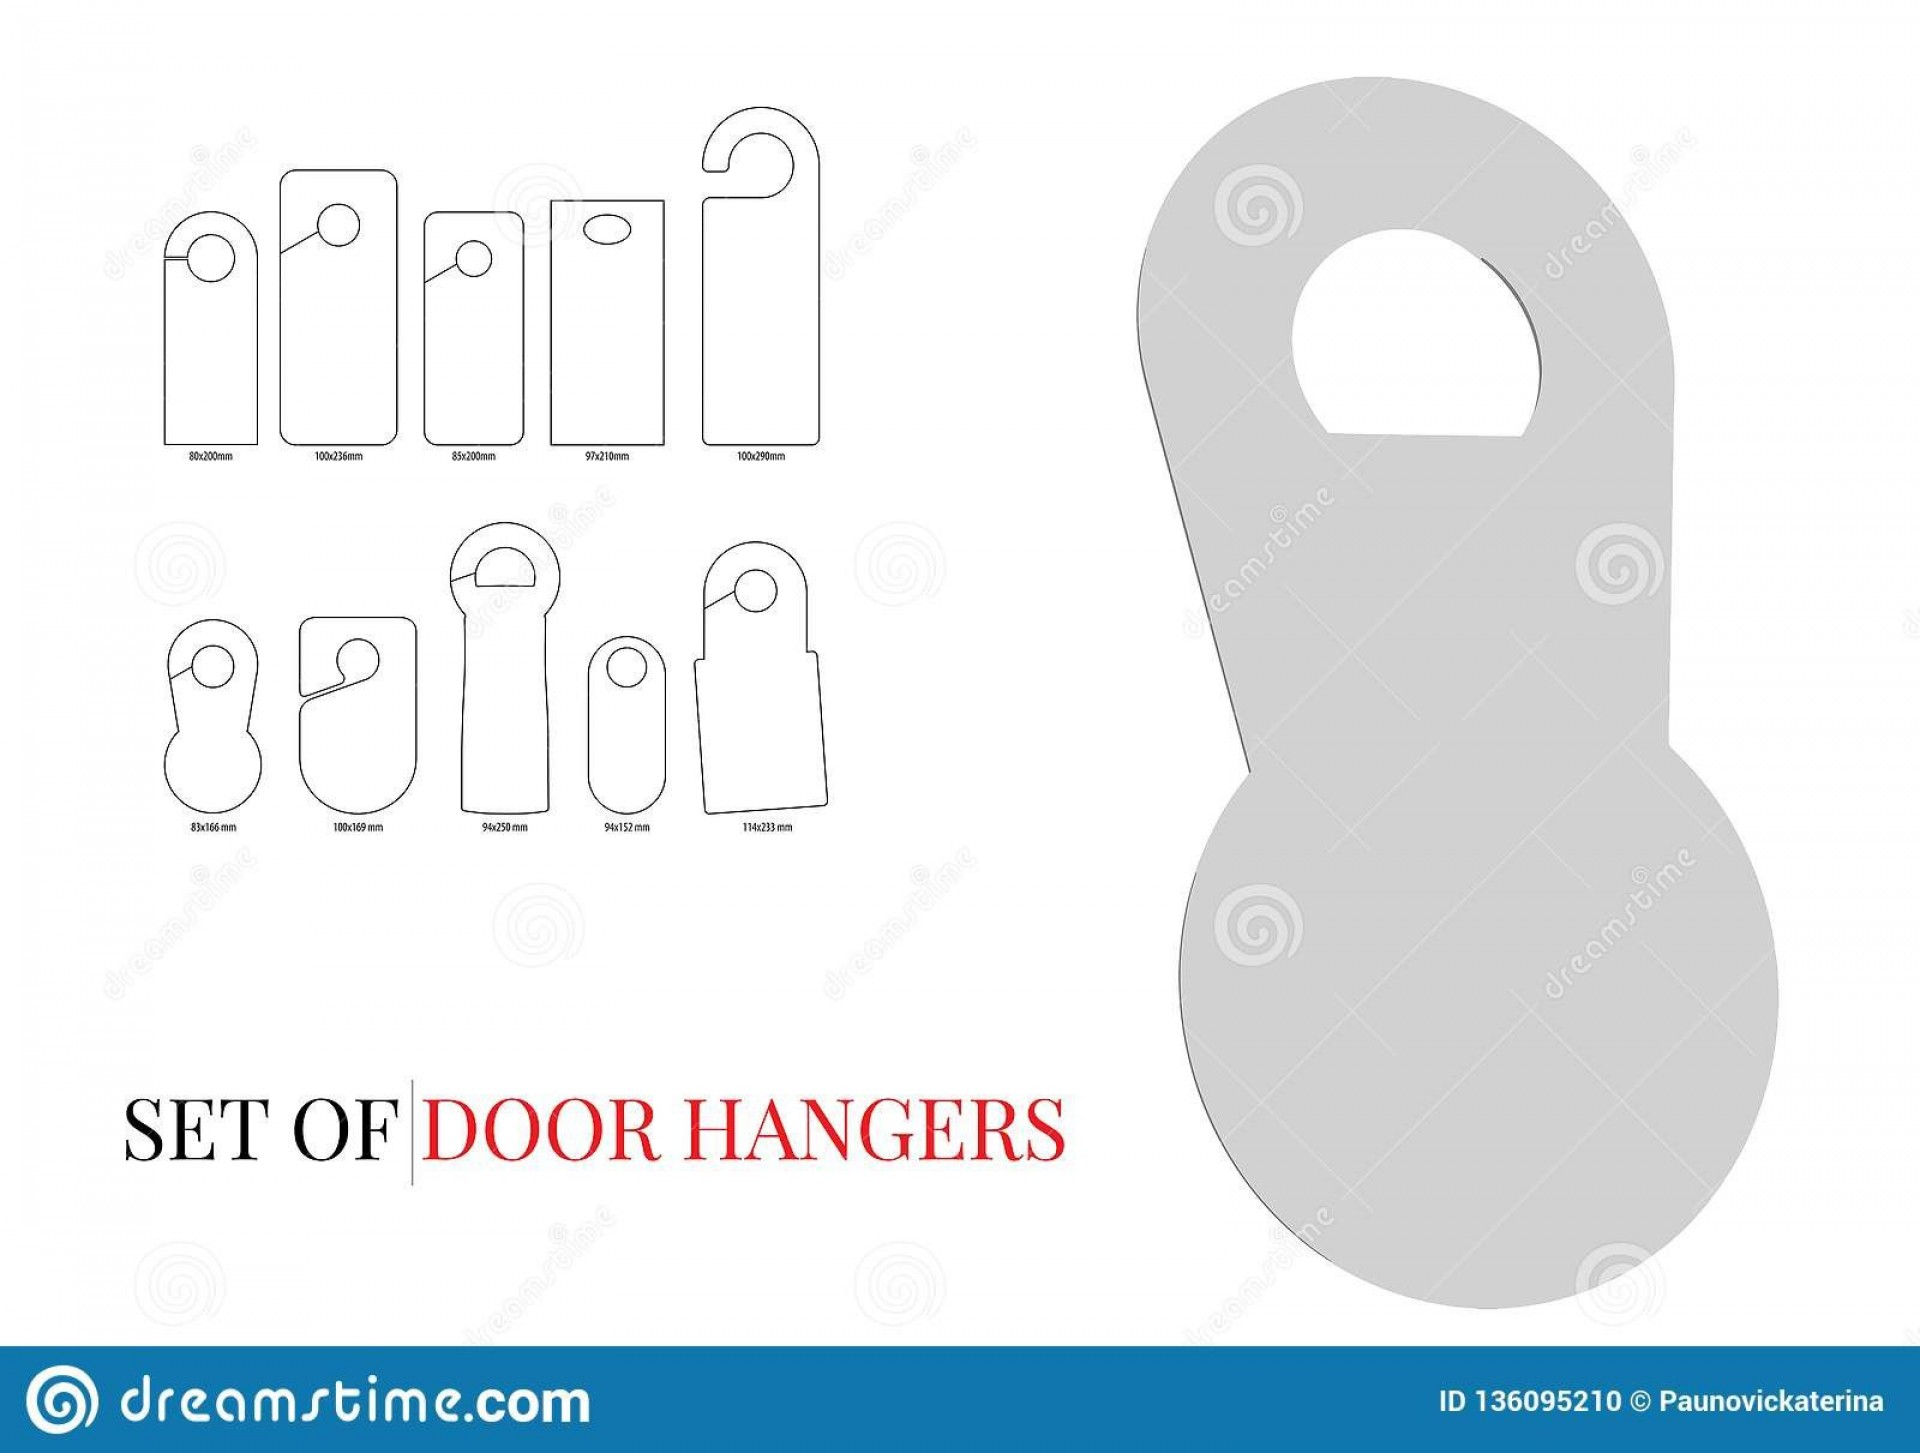 007 Best Blank Door Hanger Template Inspiration  Free Printable Microsoft Word1920